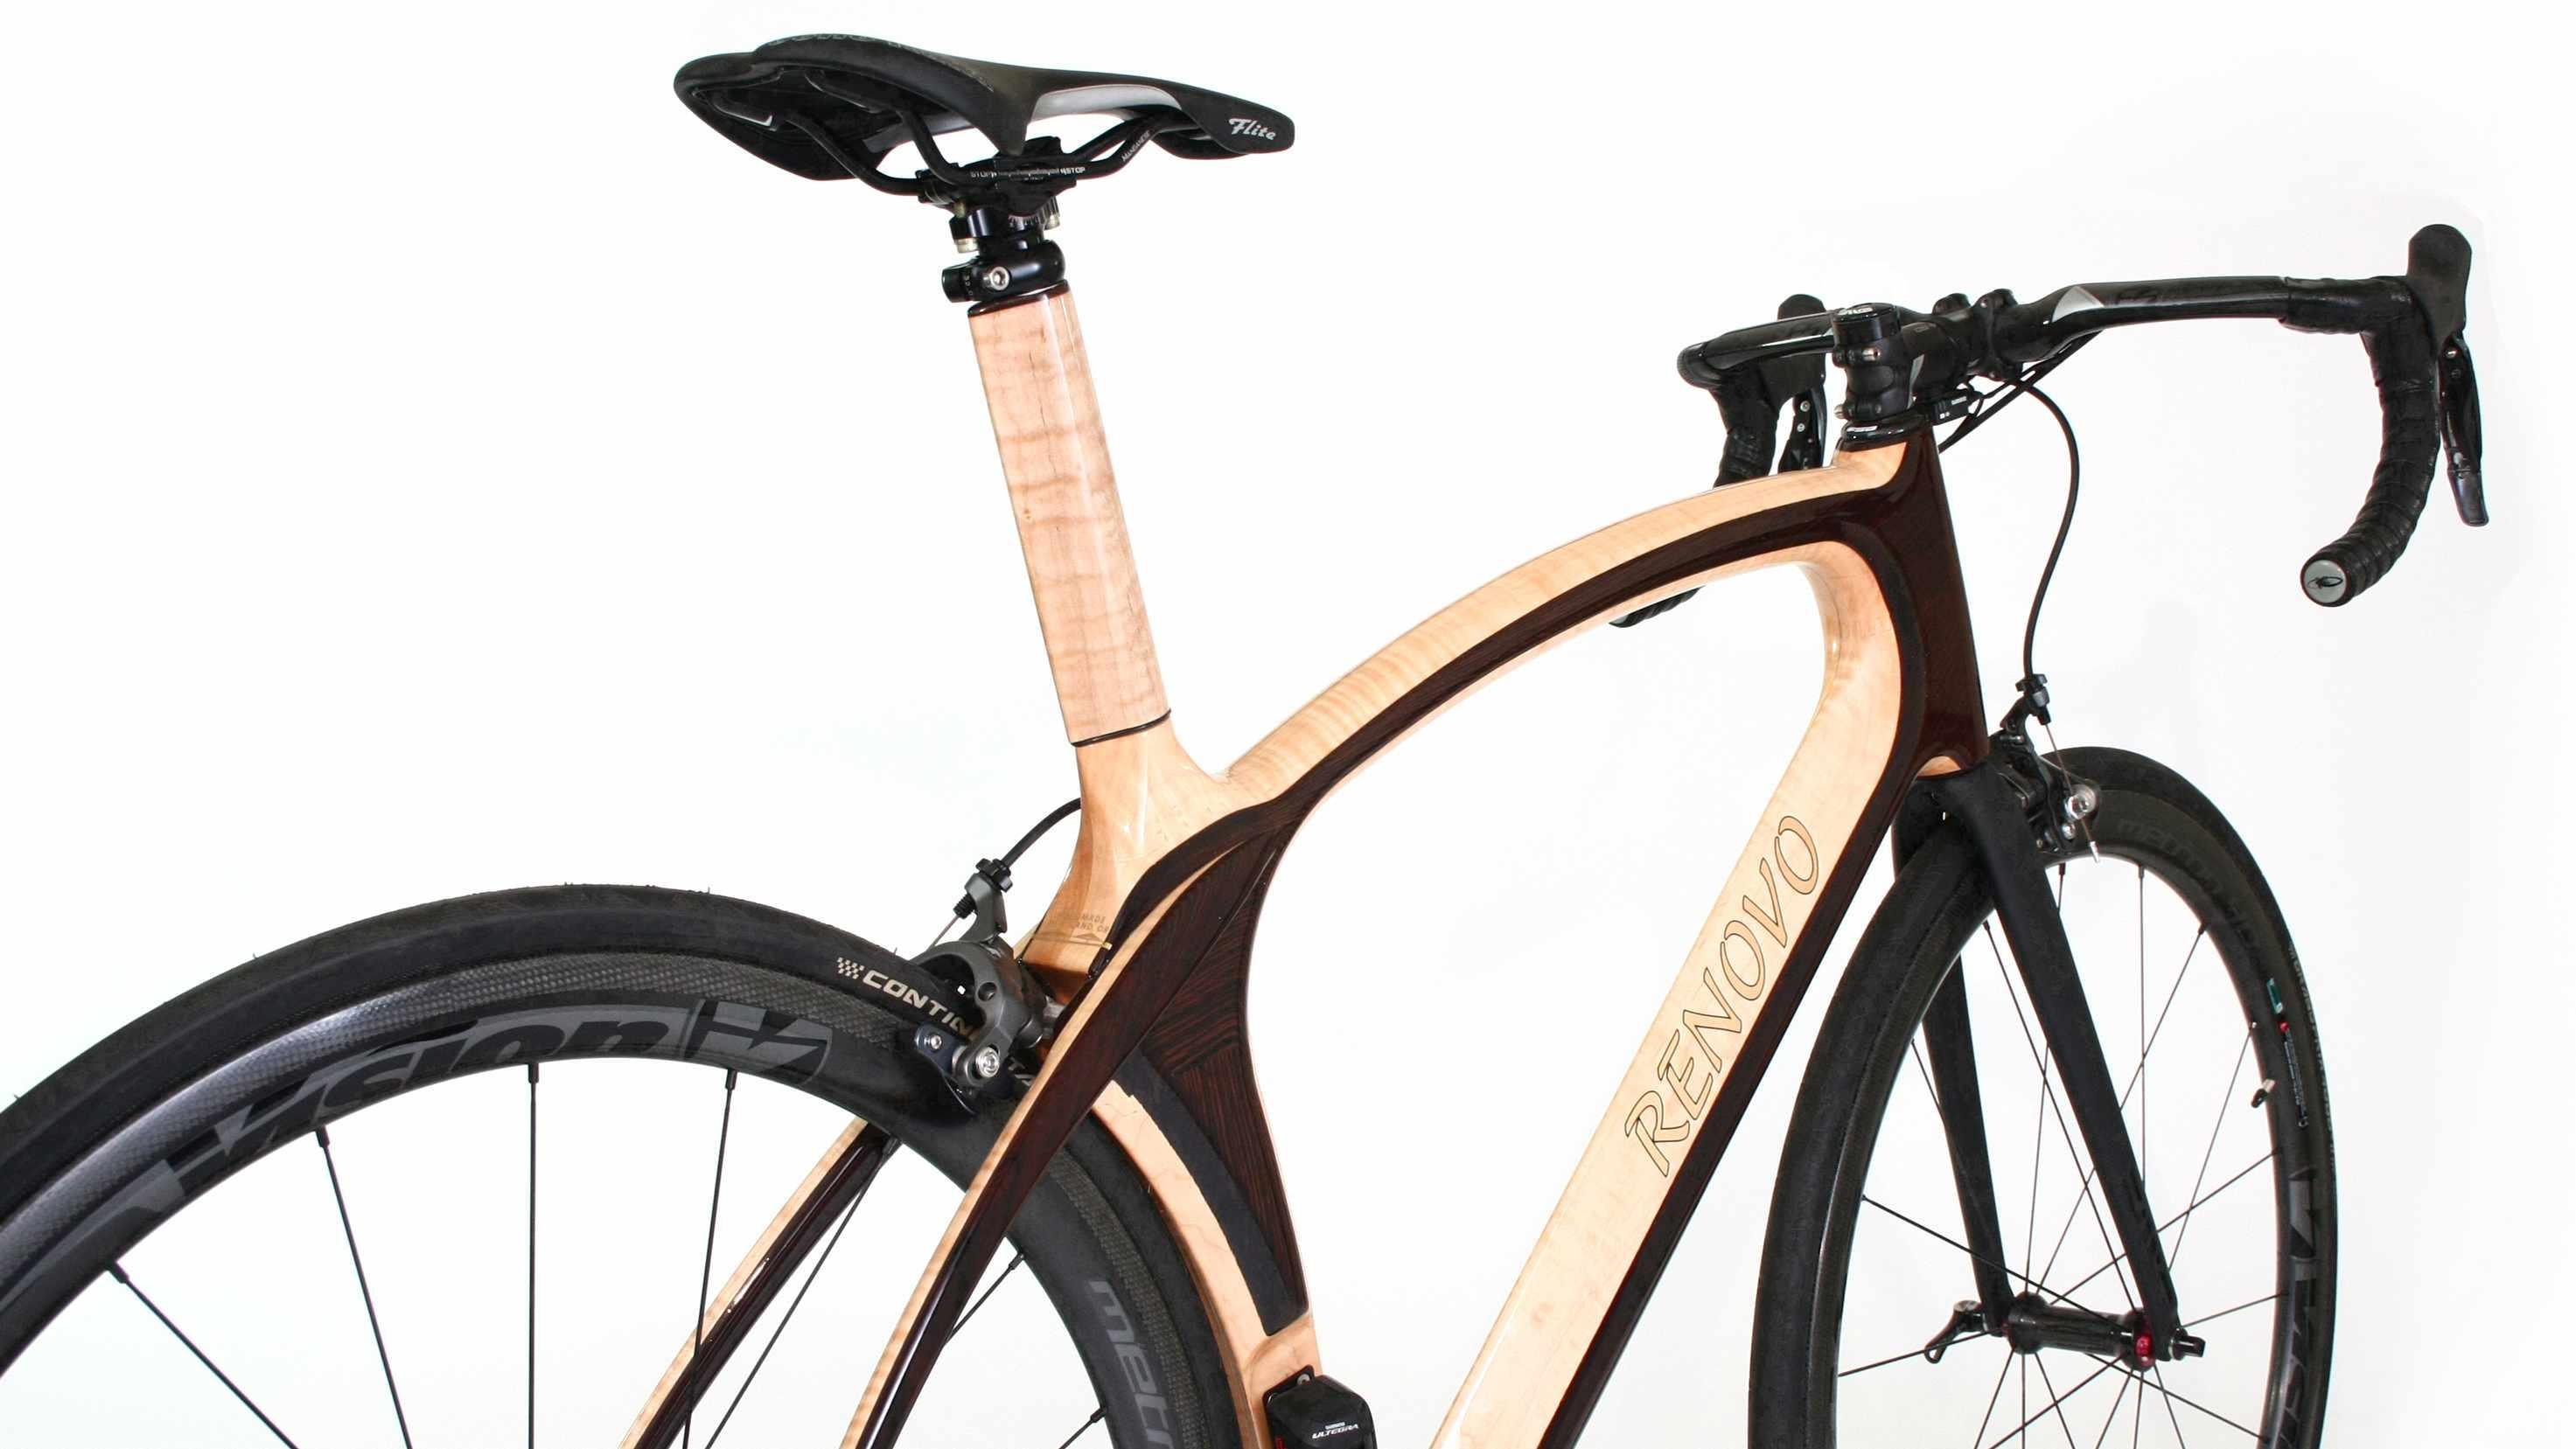 Wood frame bicycle builder Renovo has released its Aerowood